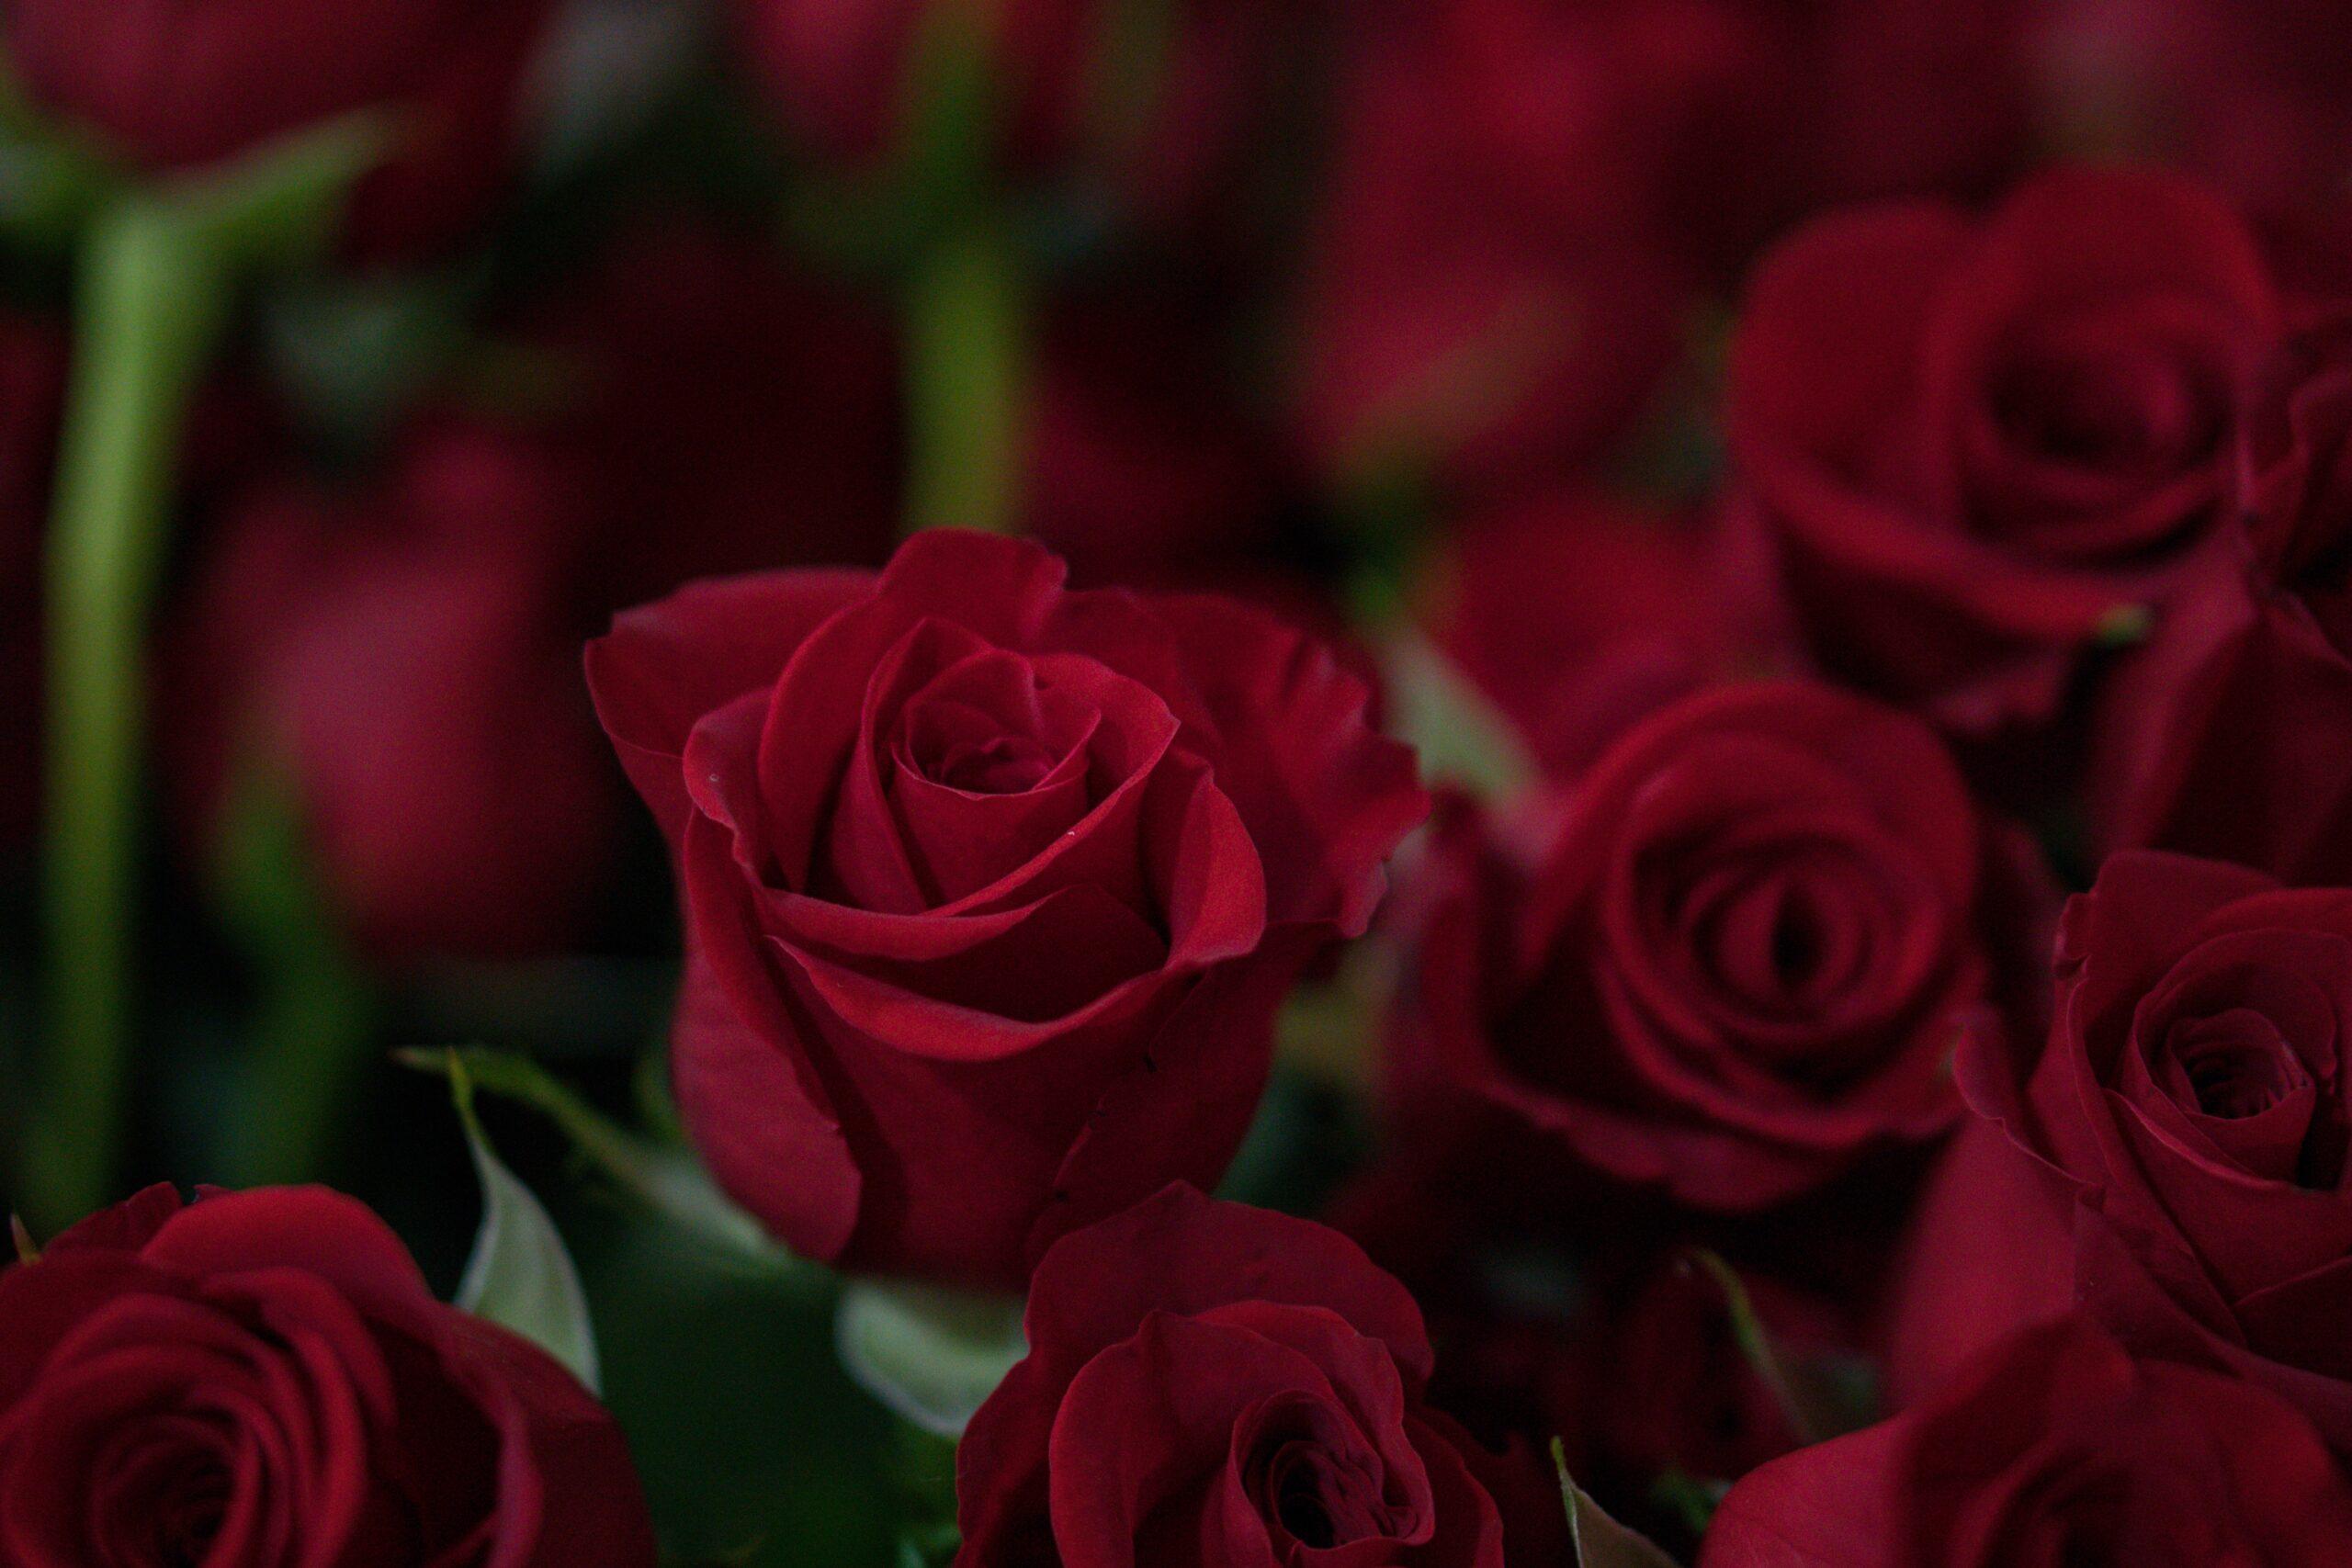 Rode rozen bestellen